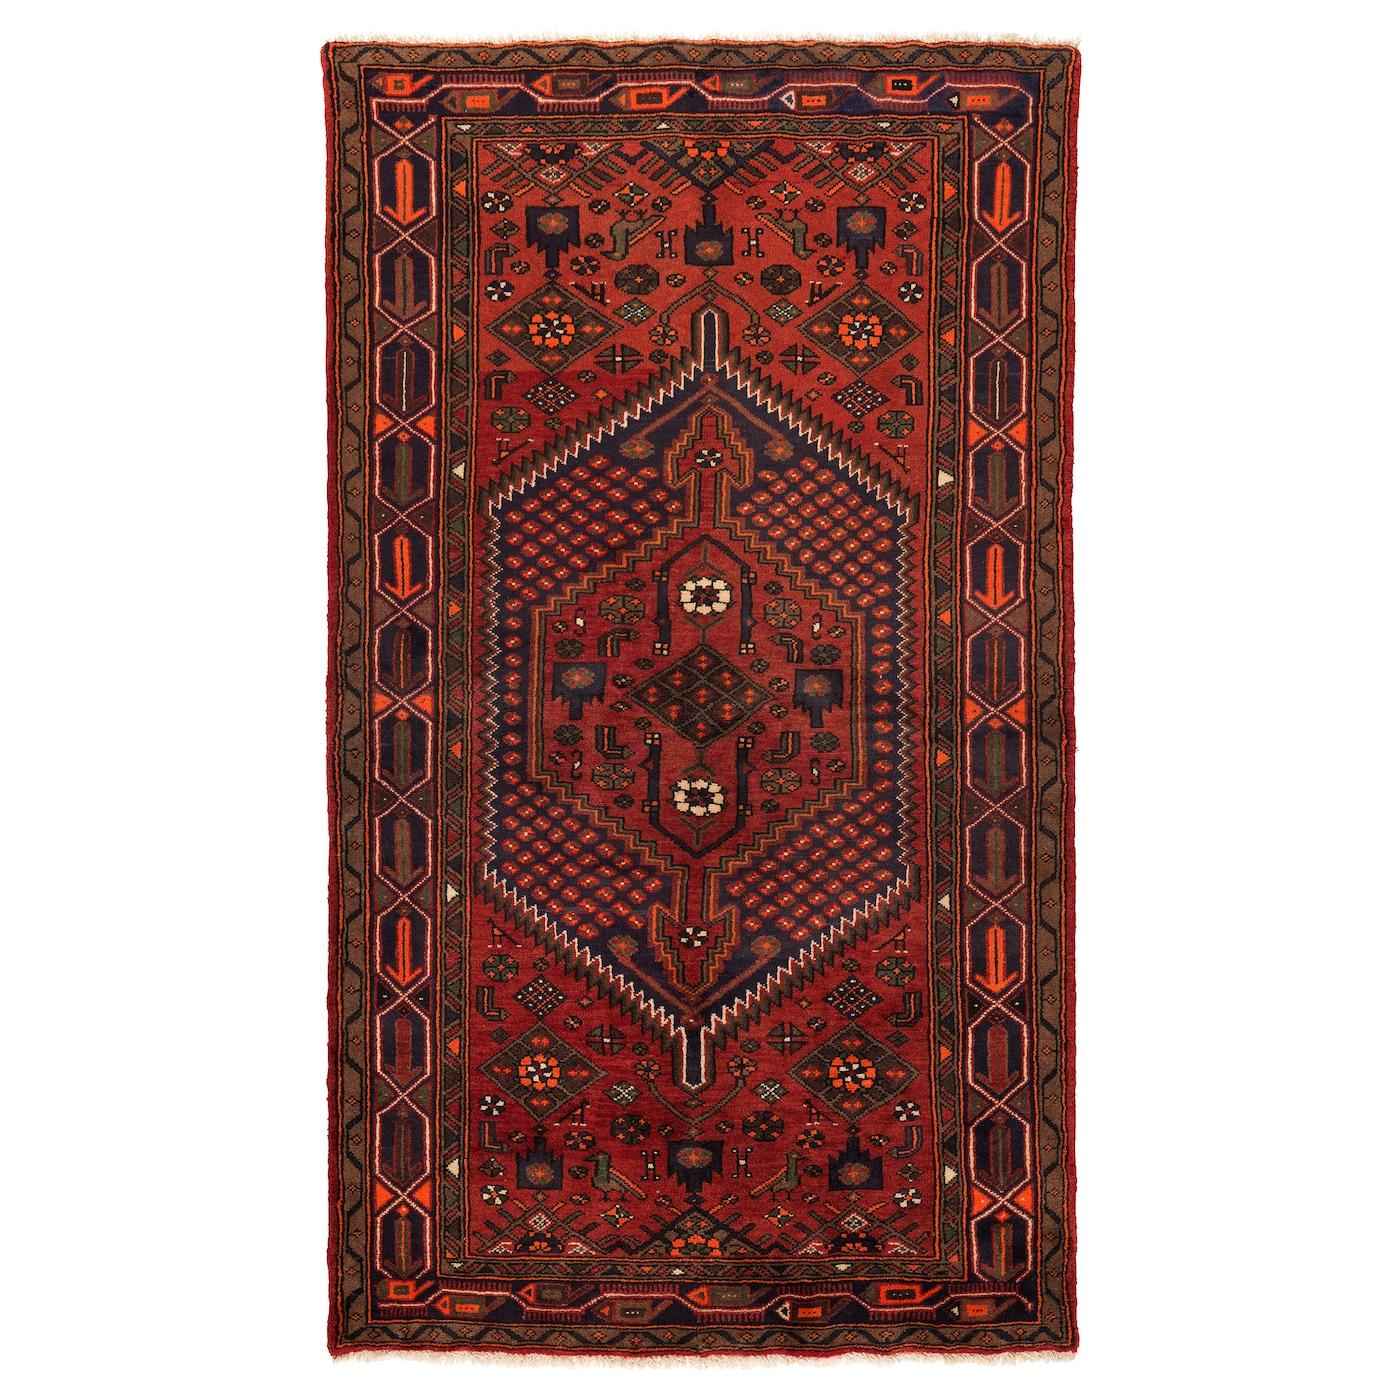 persisk hamadan tapis poils ras fait main motifs divers 140 x 200 cm ikea. Black Bedroom Furniture Sets. Home Design Ideas